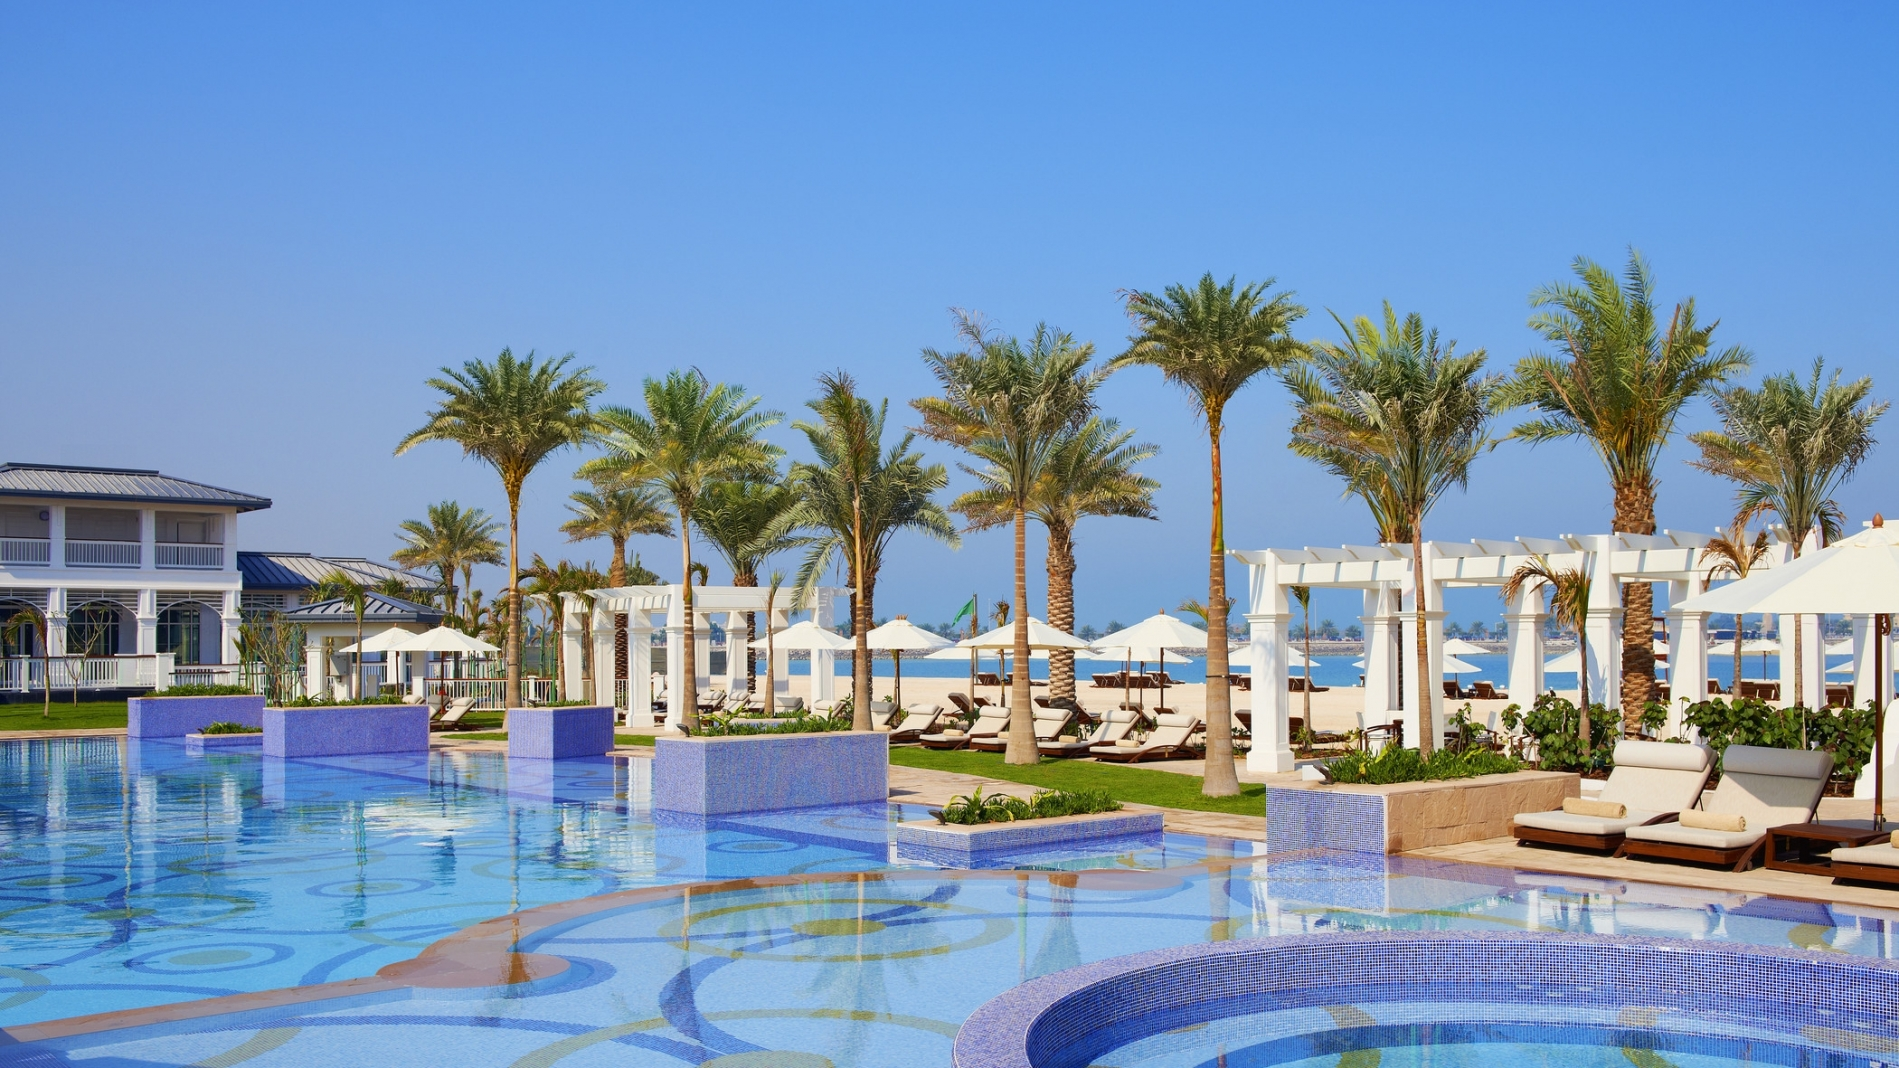 Nation Riviera Beach Club, St. Regis Abu Dhabi